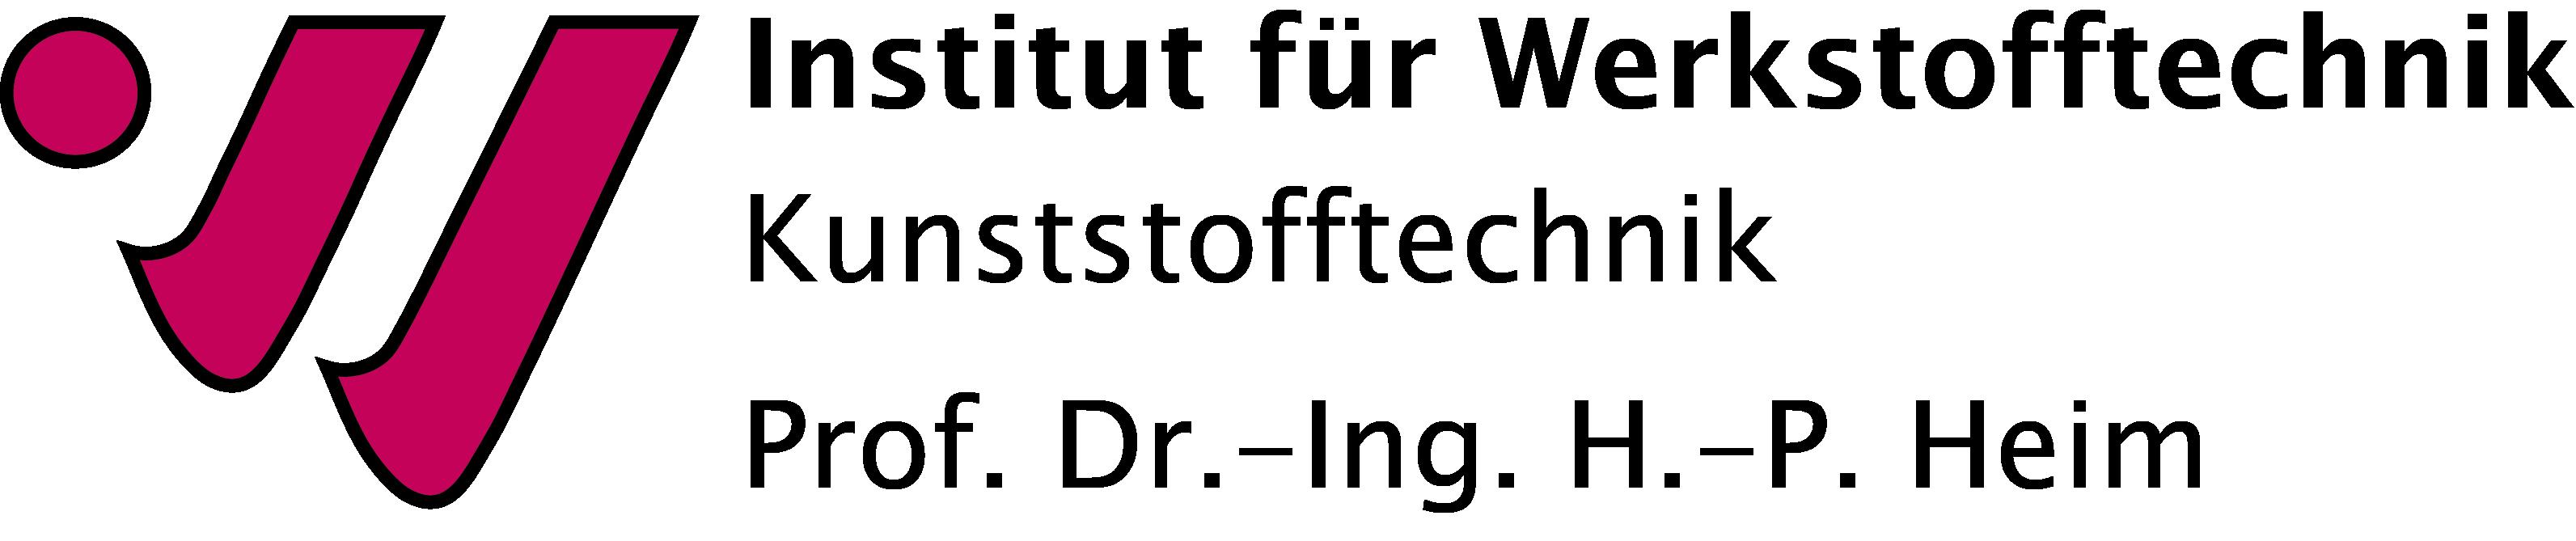 Logo IfW